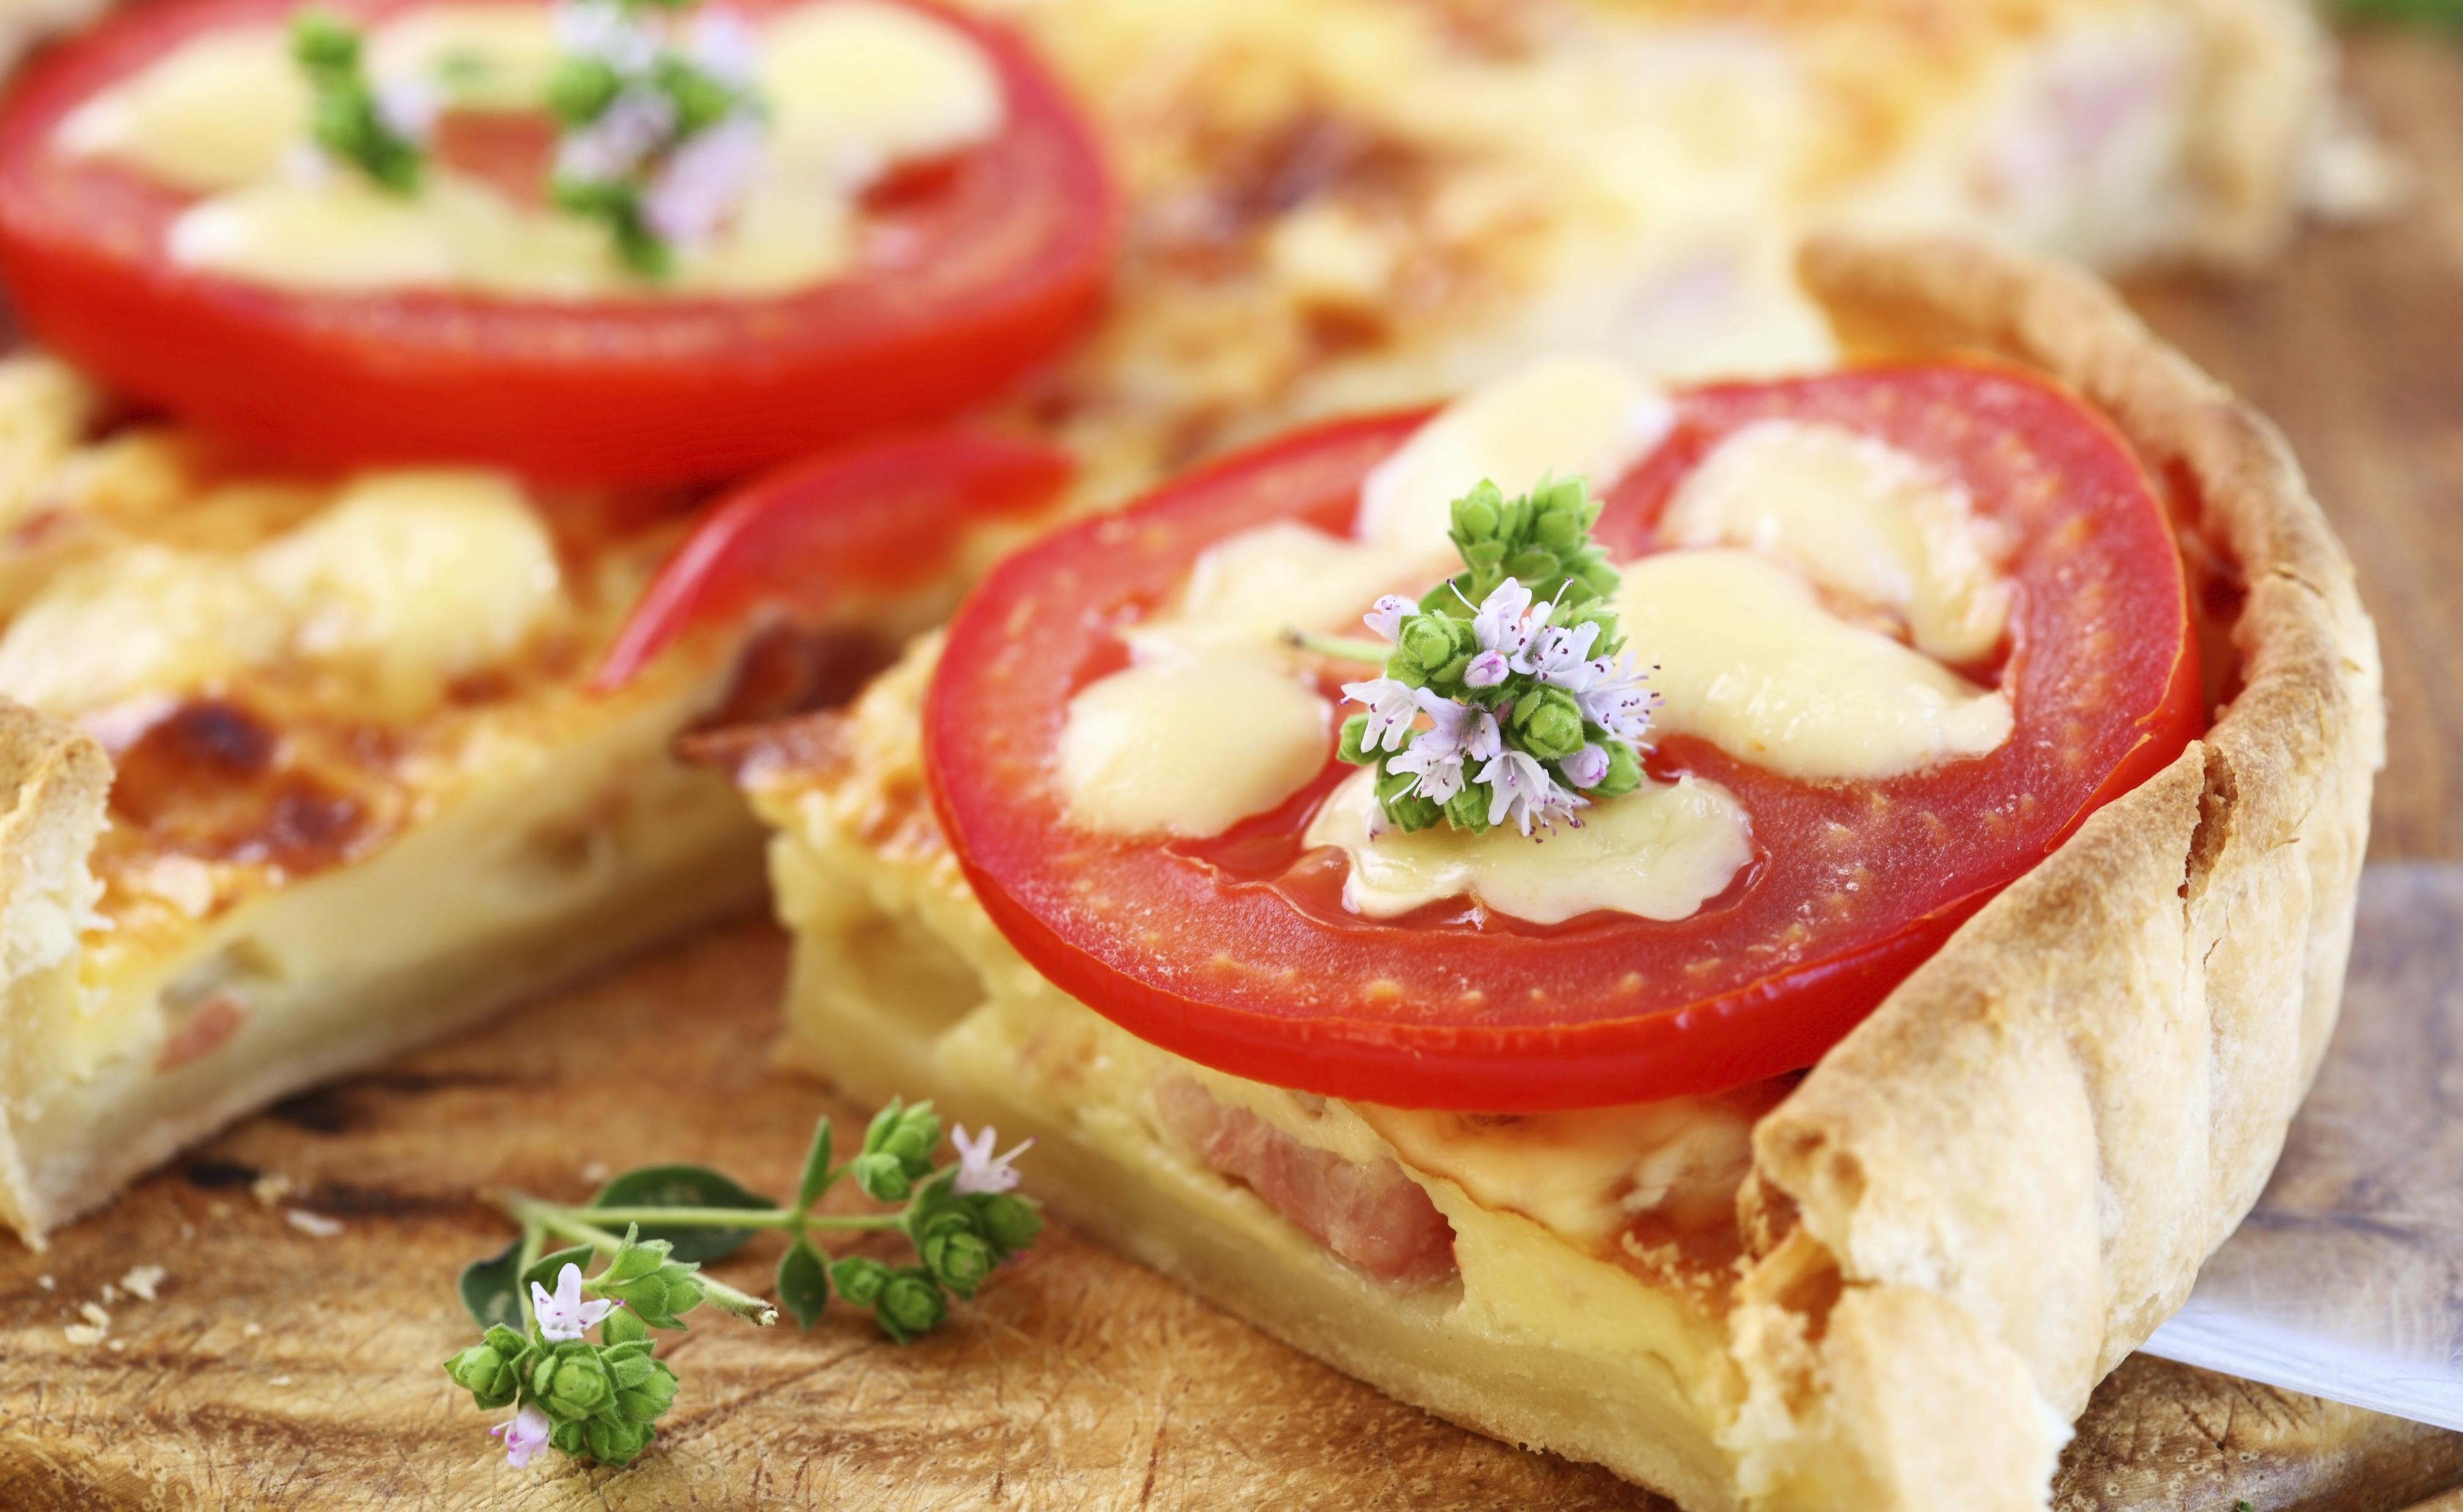 Quiche de jamón, tomate y nata